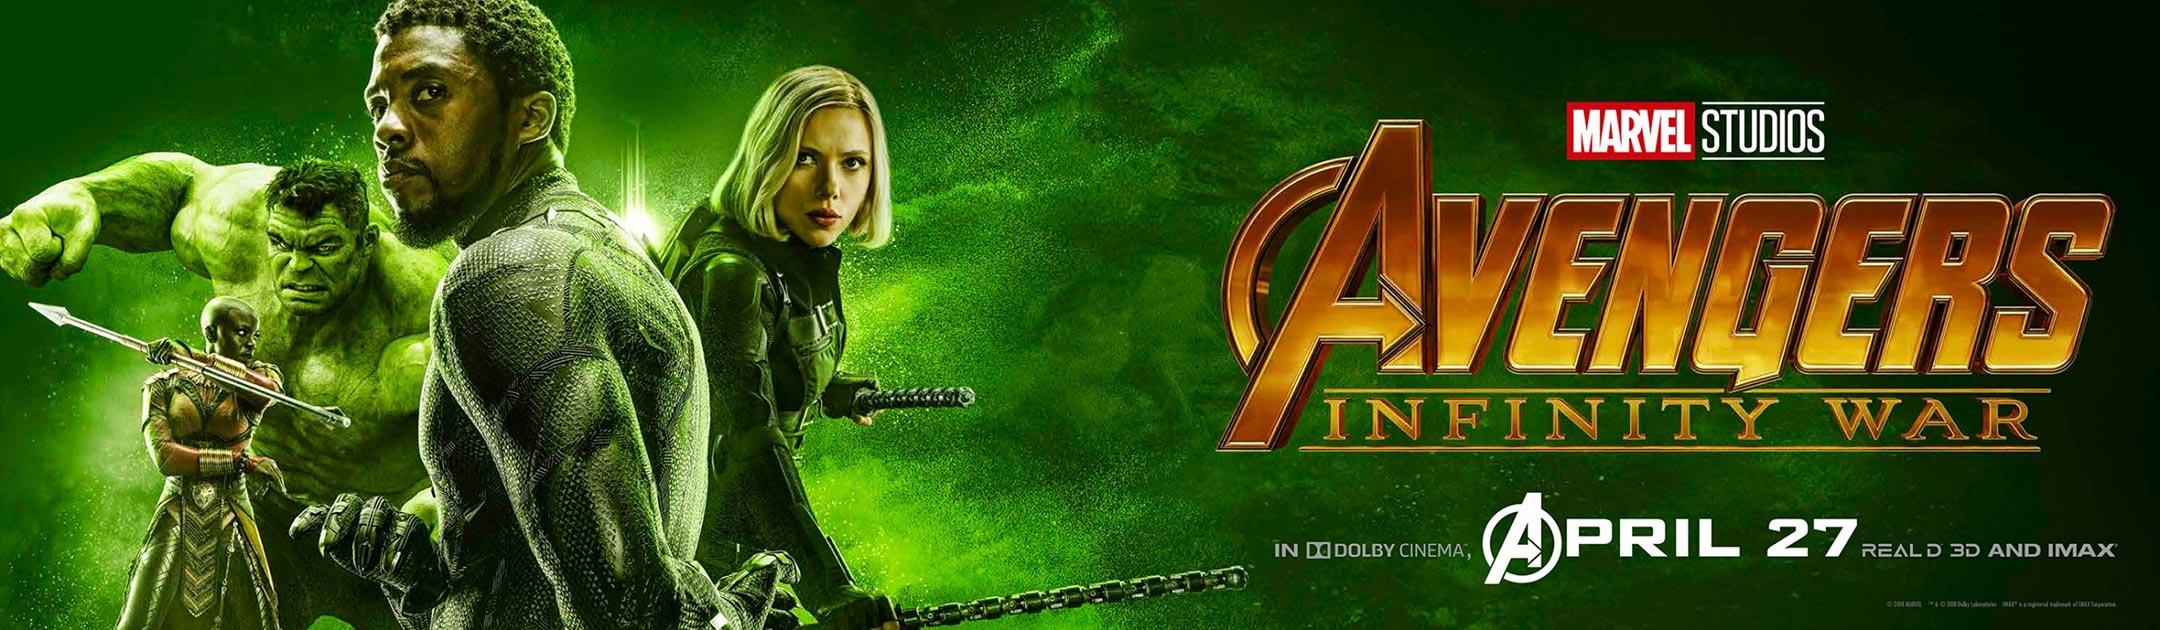 Avengers: Infinity War Poster #40